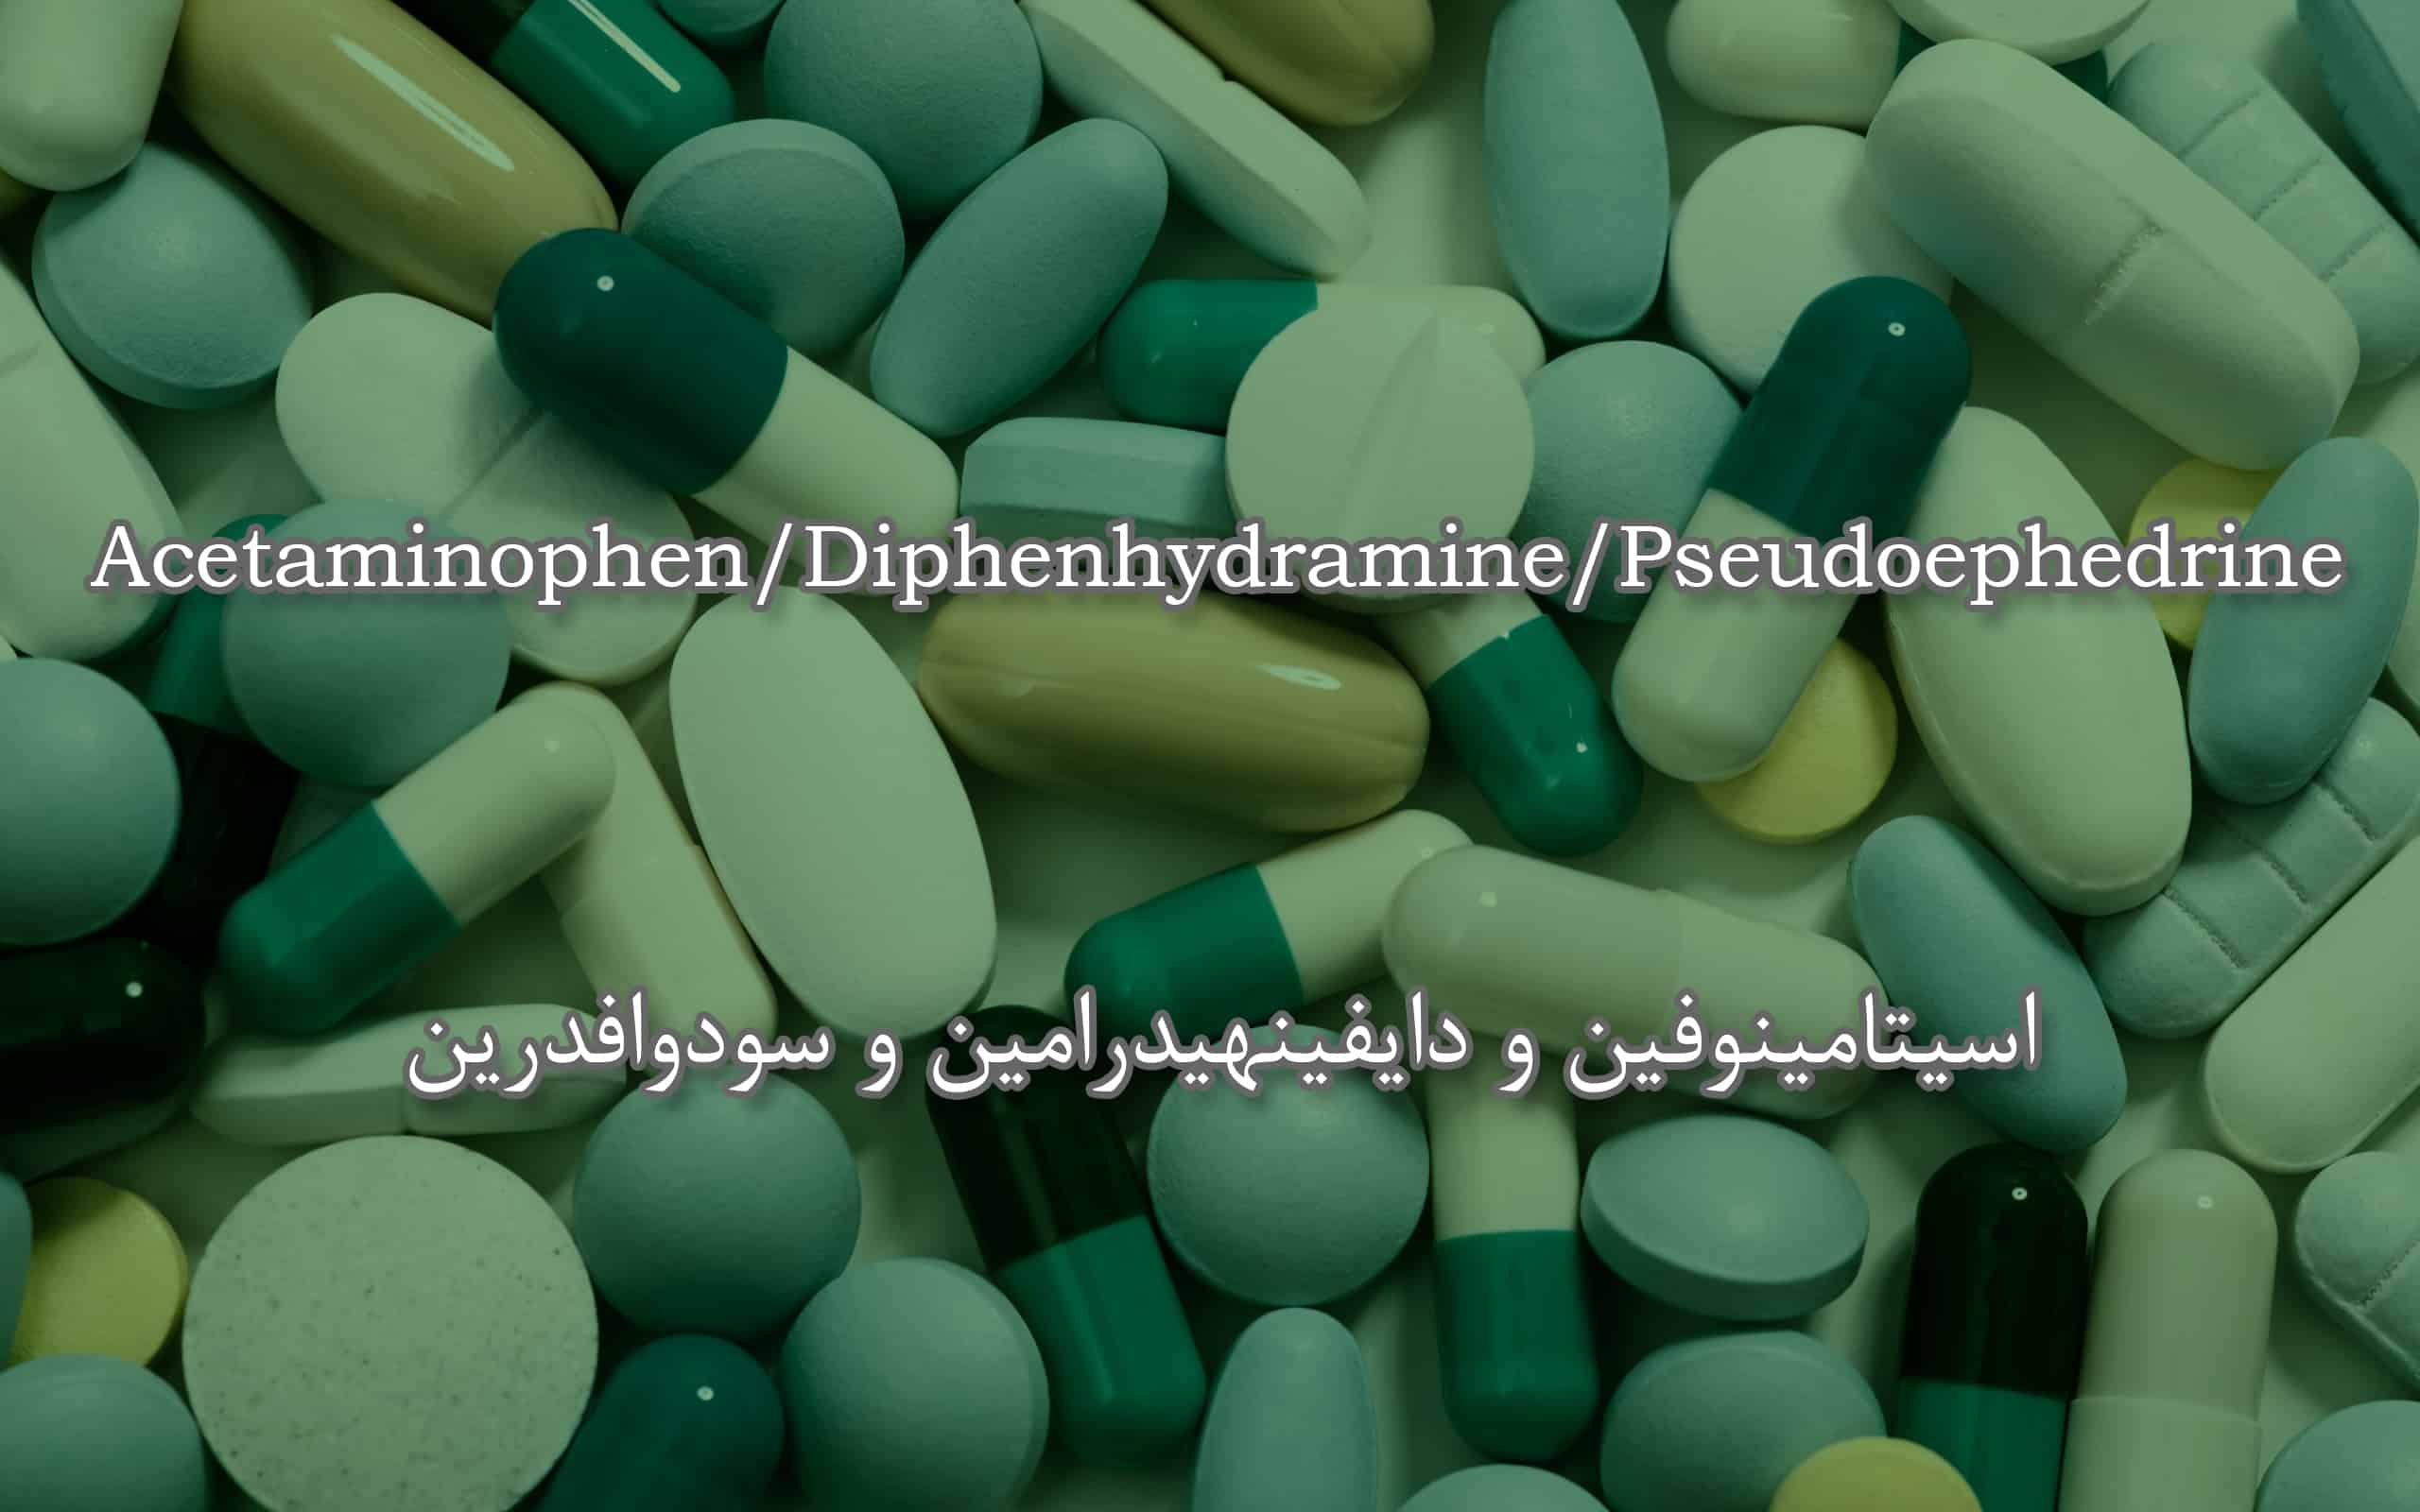 Acetaminophen-Diphenhydramine-Pseudoephedrine